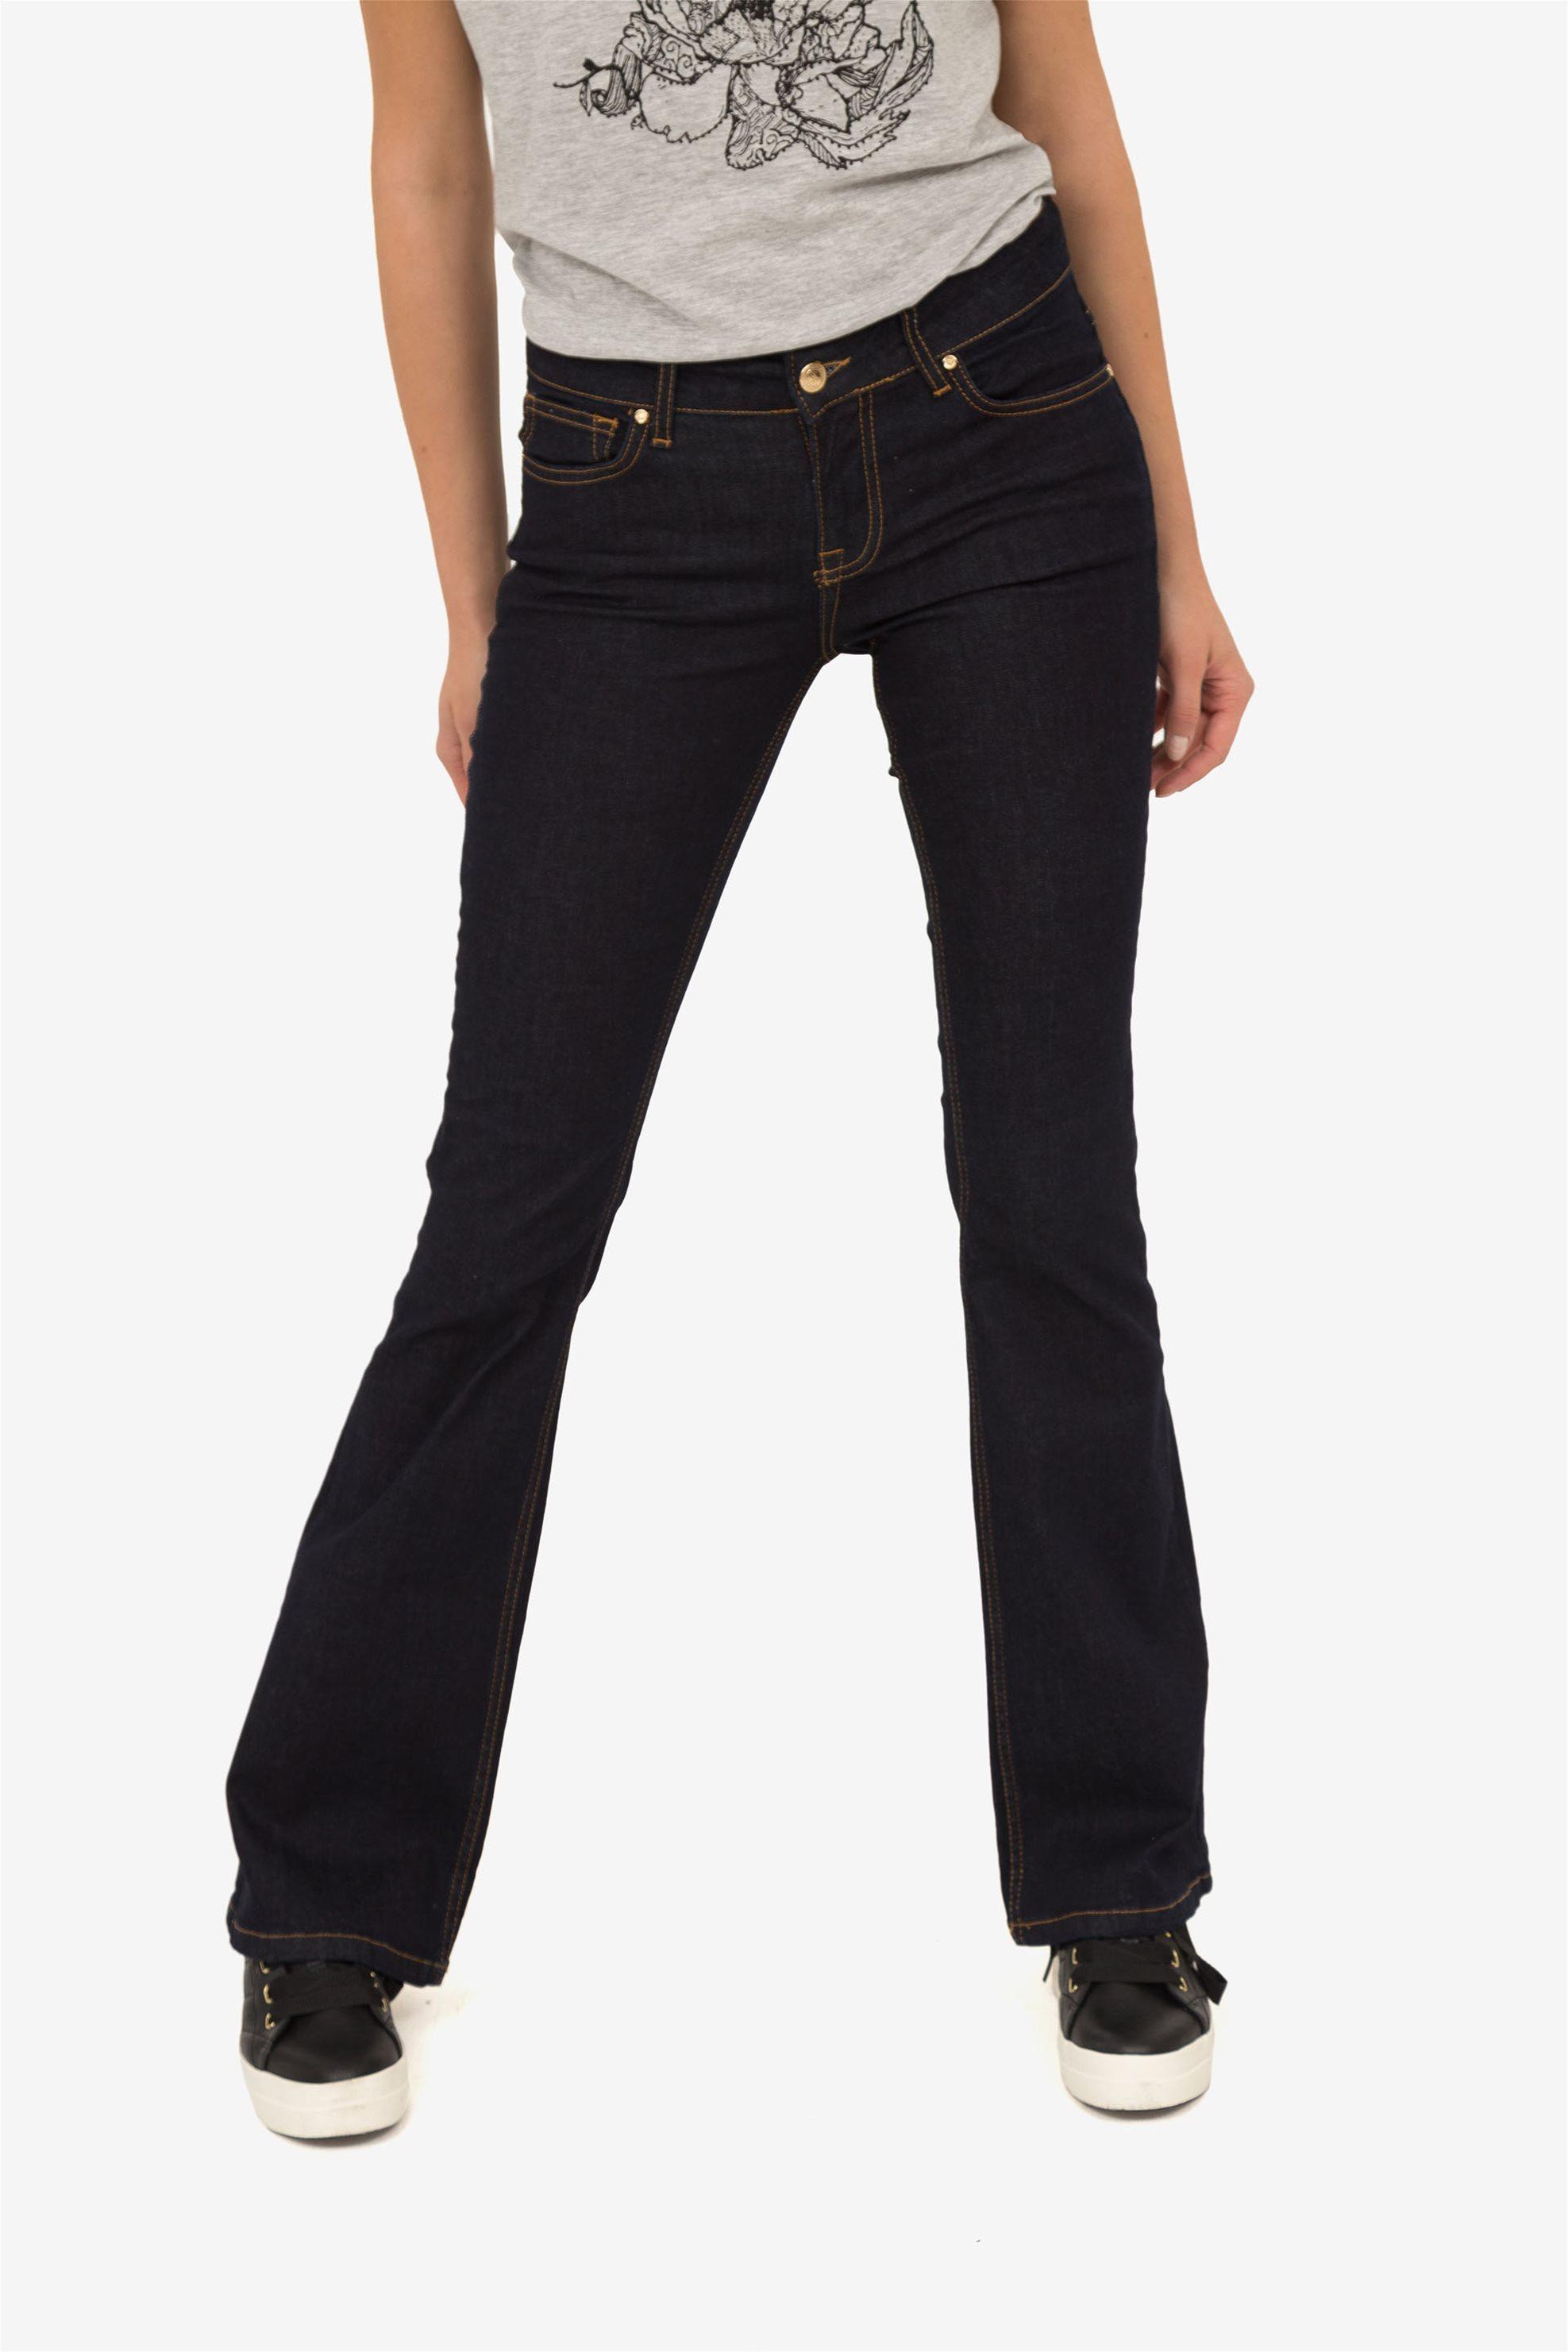 Sarah Lawrence γυναικείο τζην καμπάνα - 1-850054 - Μπλε Σκούρο γυναικα   ρουχα   jeans   καμπάνα   bootcut